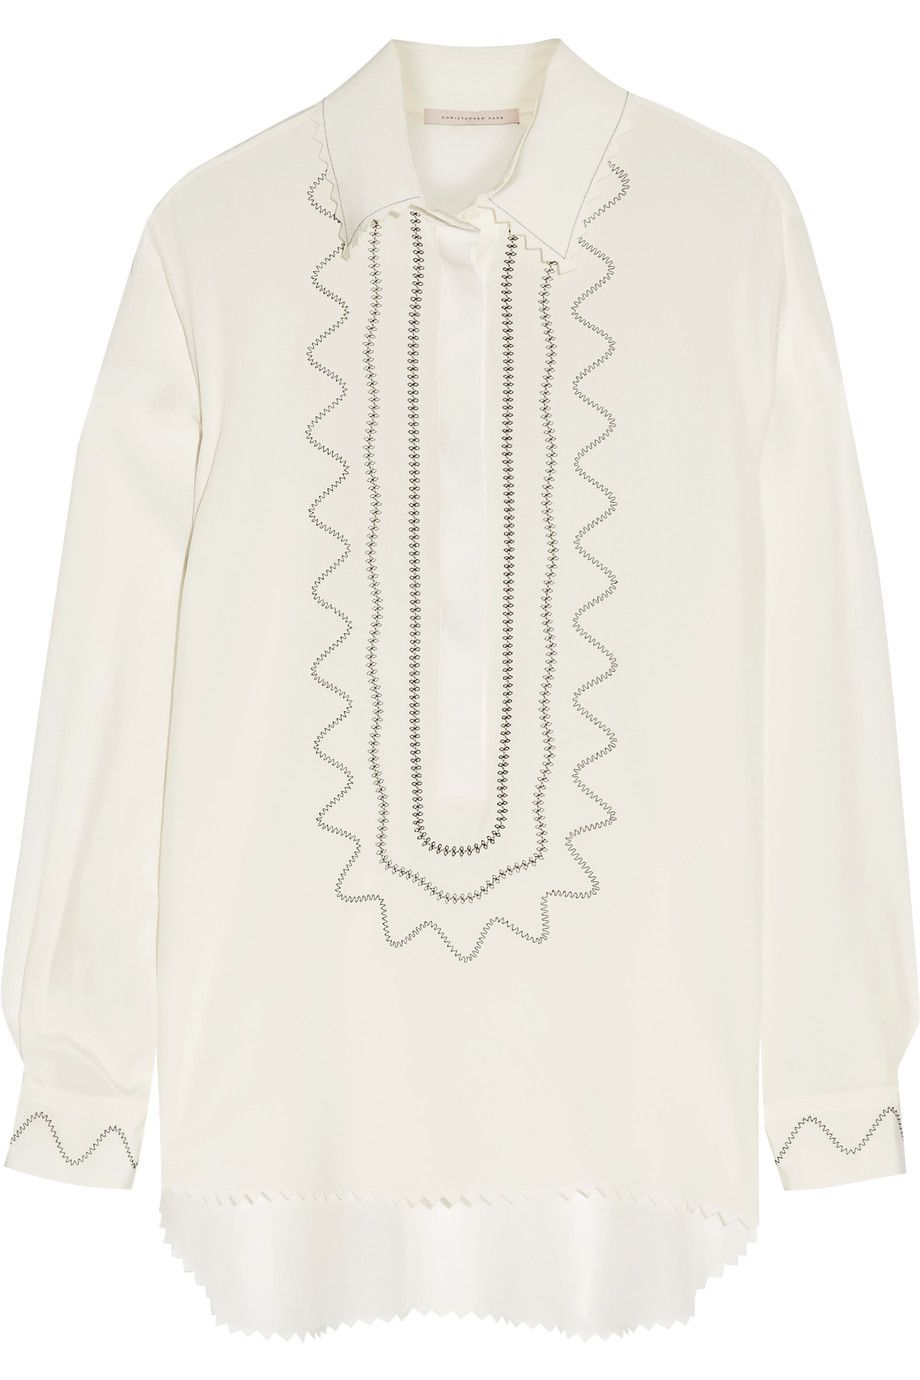 ca8f518928daf CHRISTOPHER KANE Embroidered Silk Crepe De Chine Blouse.  christopherkane   cloth  blouse